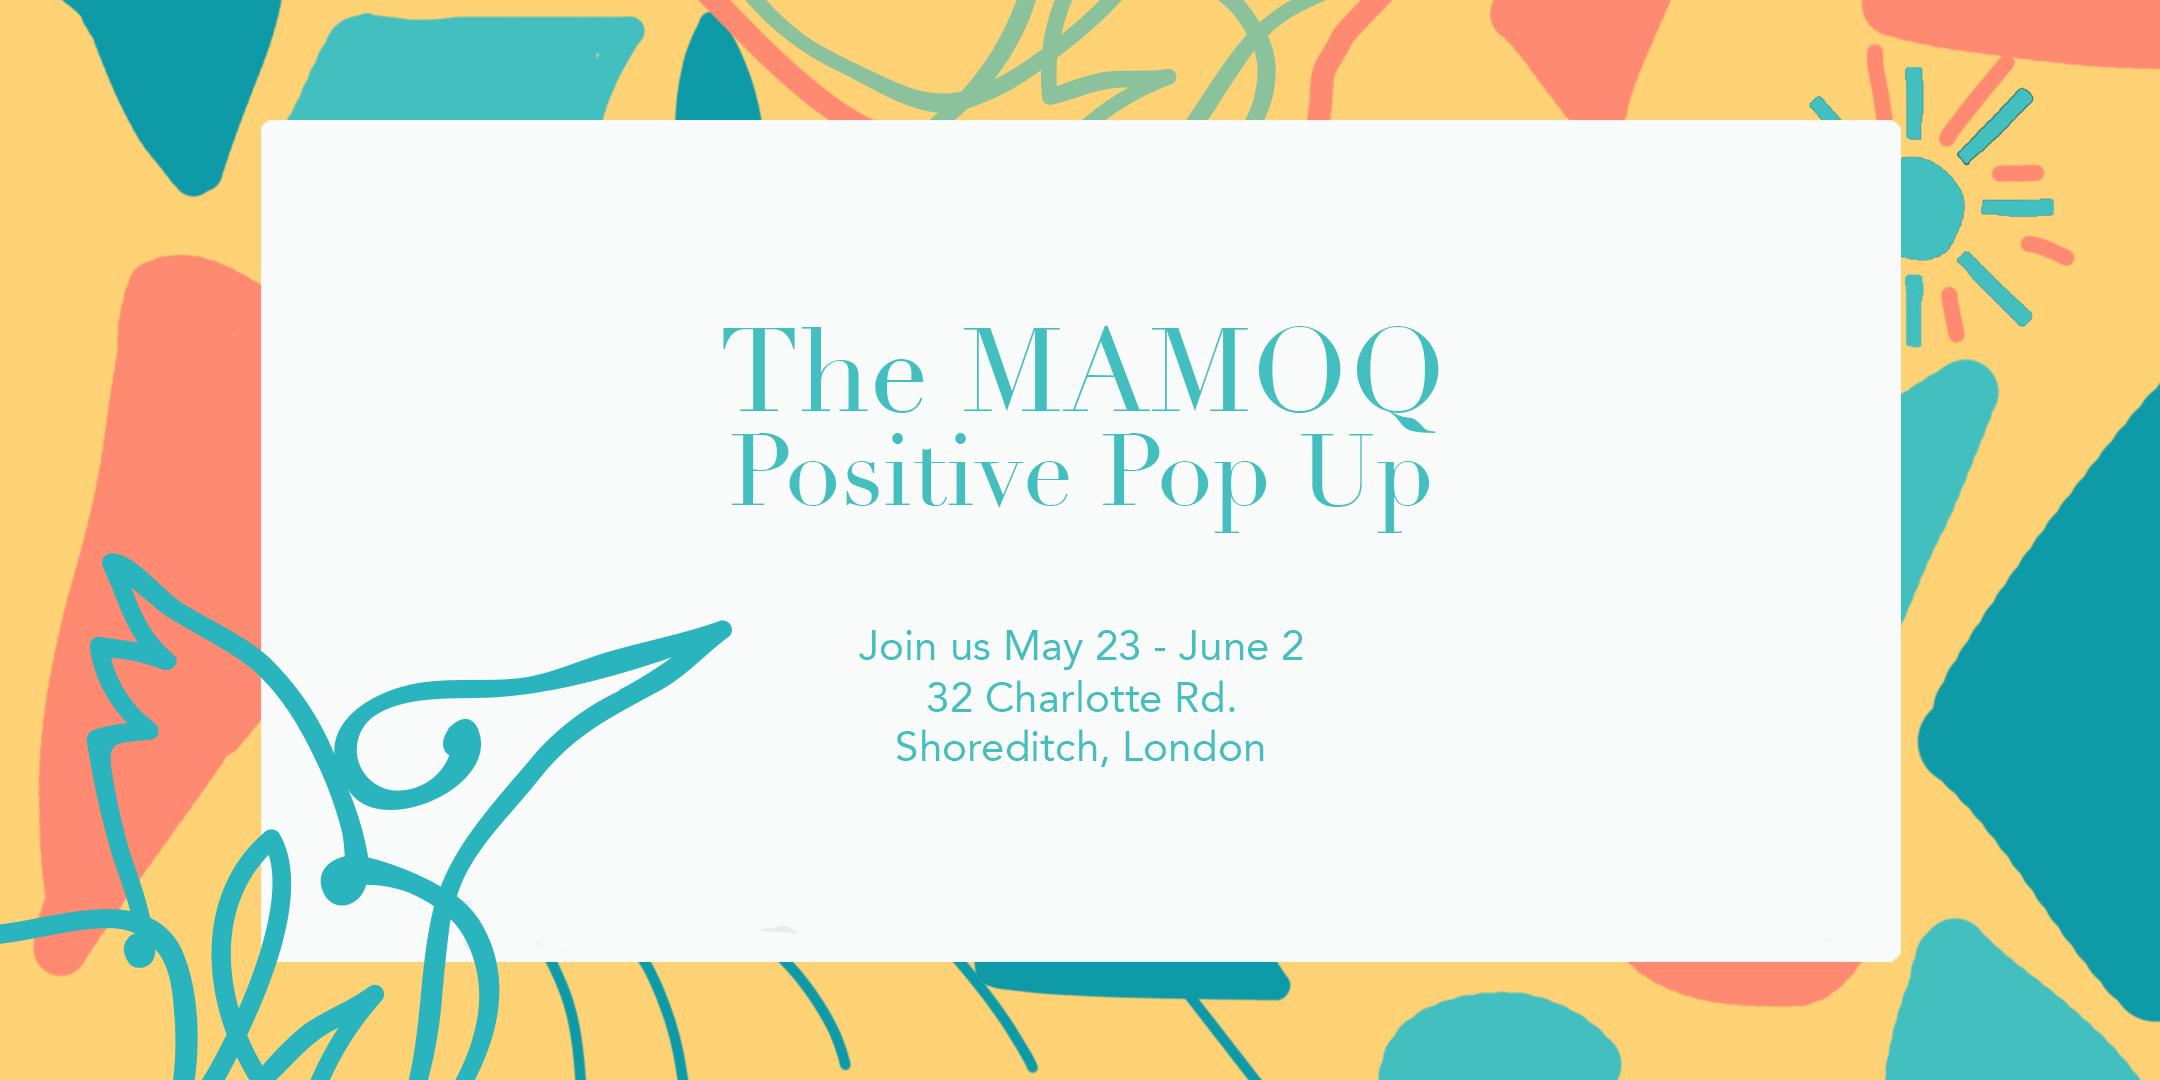 MAMOQ Positive Fashion Pop UP